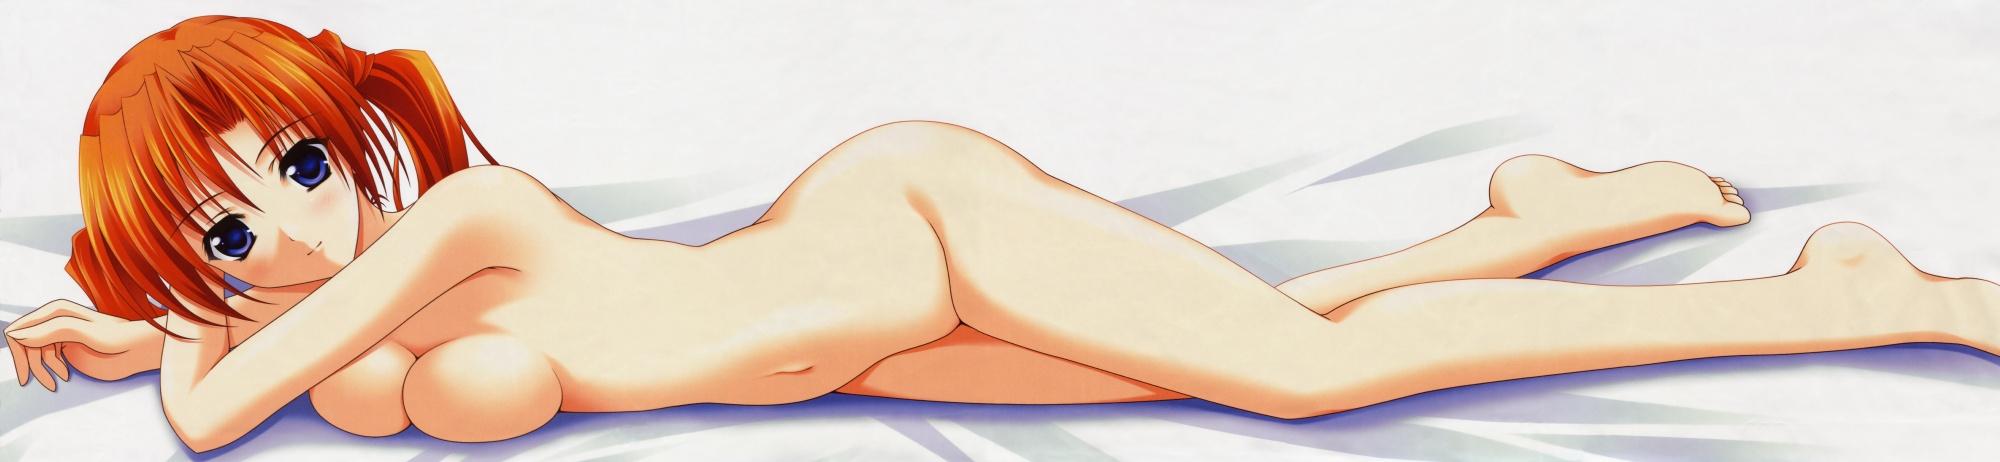 ass barefoot bed blue_eyes blush bow breasts cleavage minakami_sakuya navel no_bra nude orange_hair sister_princess topless twintails